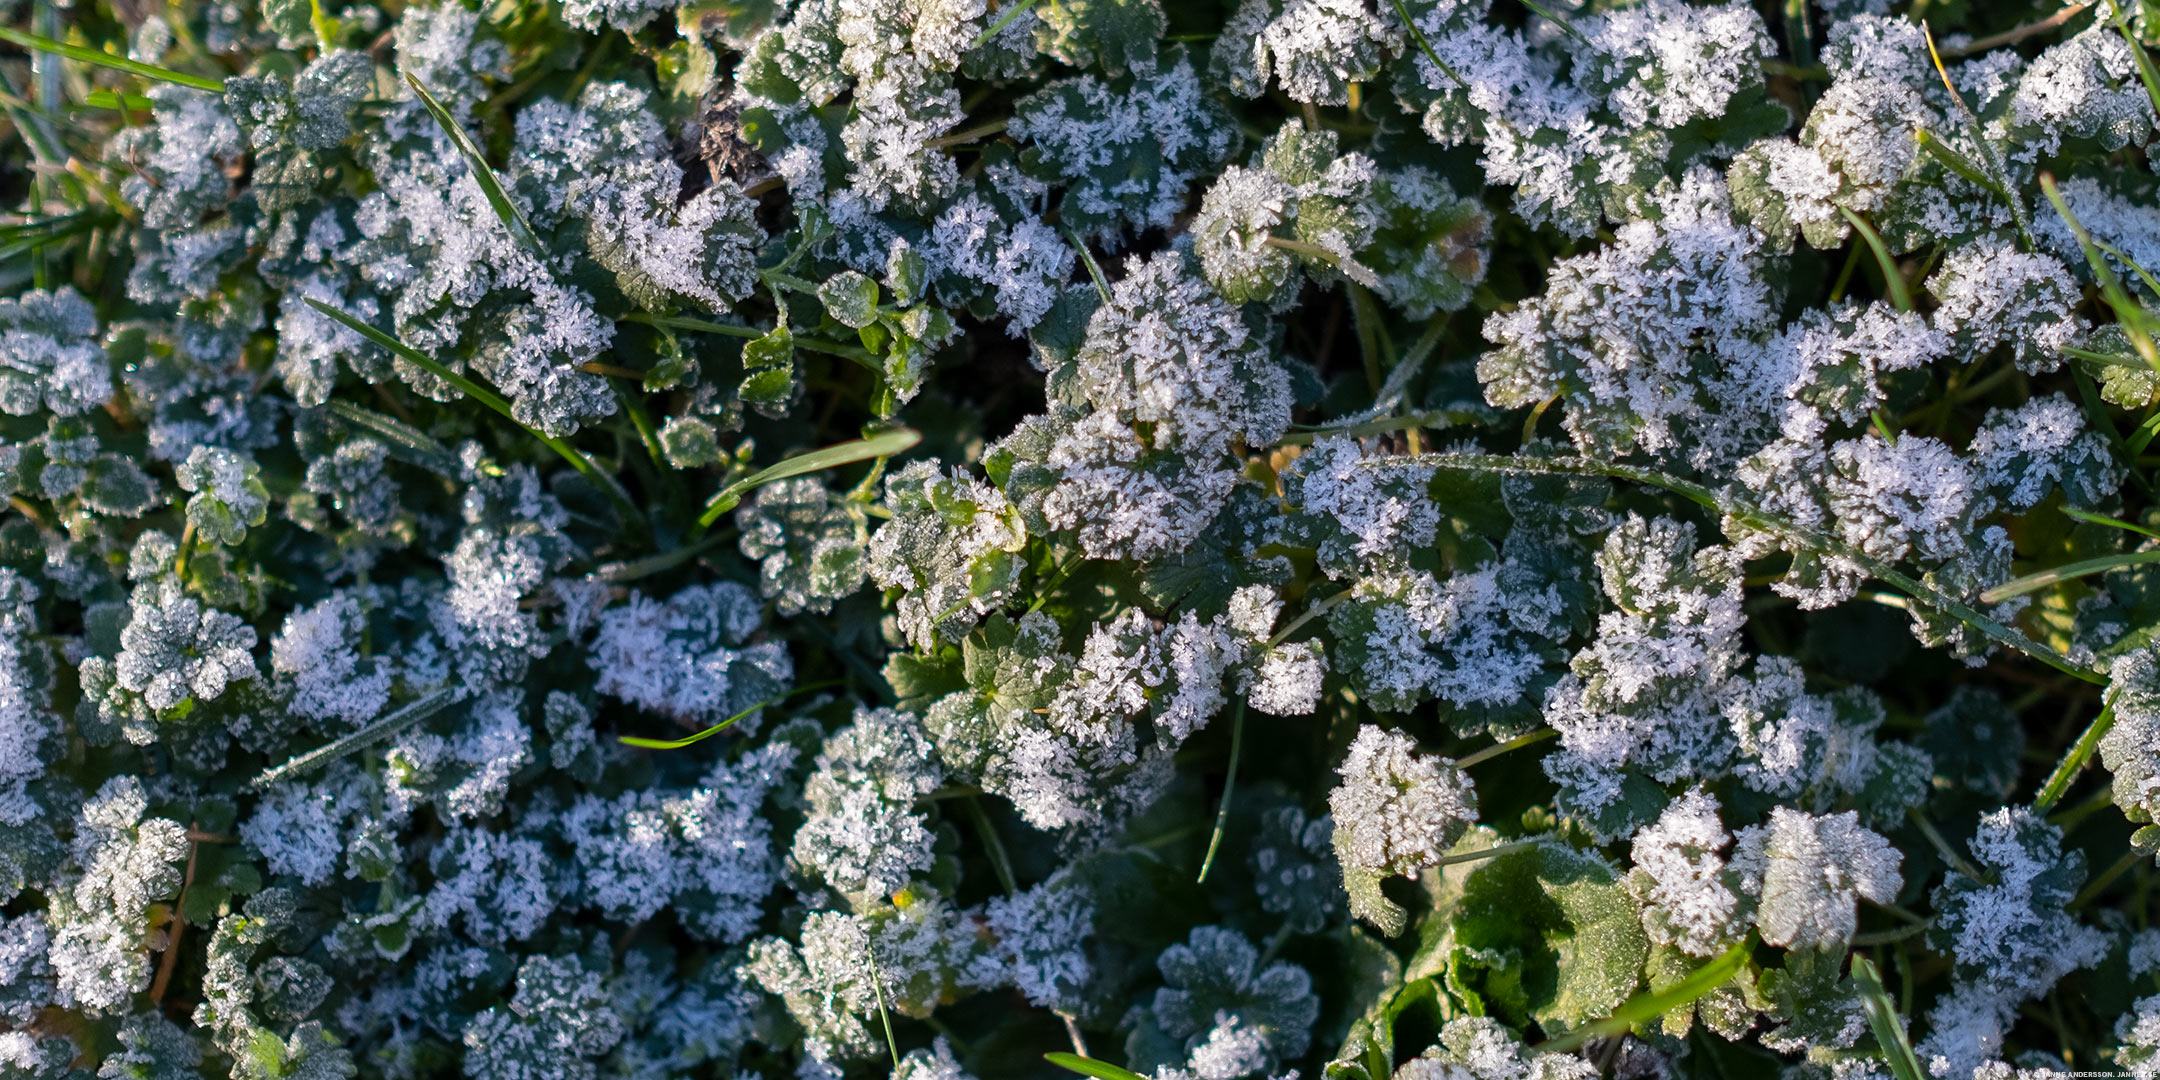 Frost i gräset och solsken i blick |© Janne A